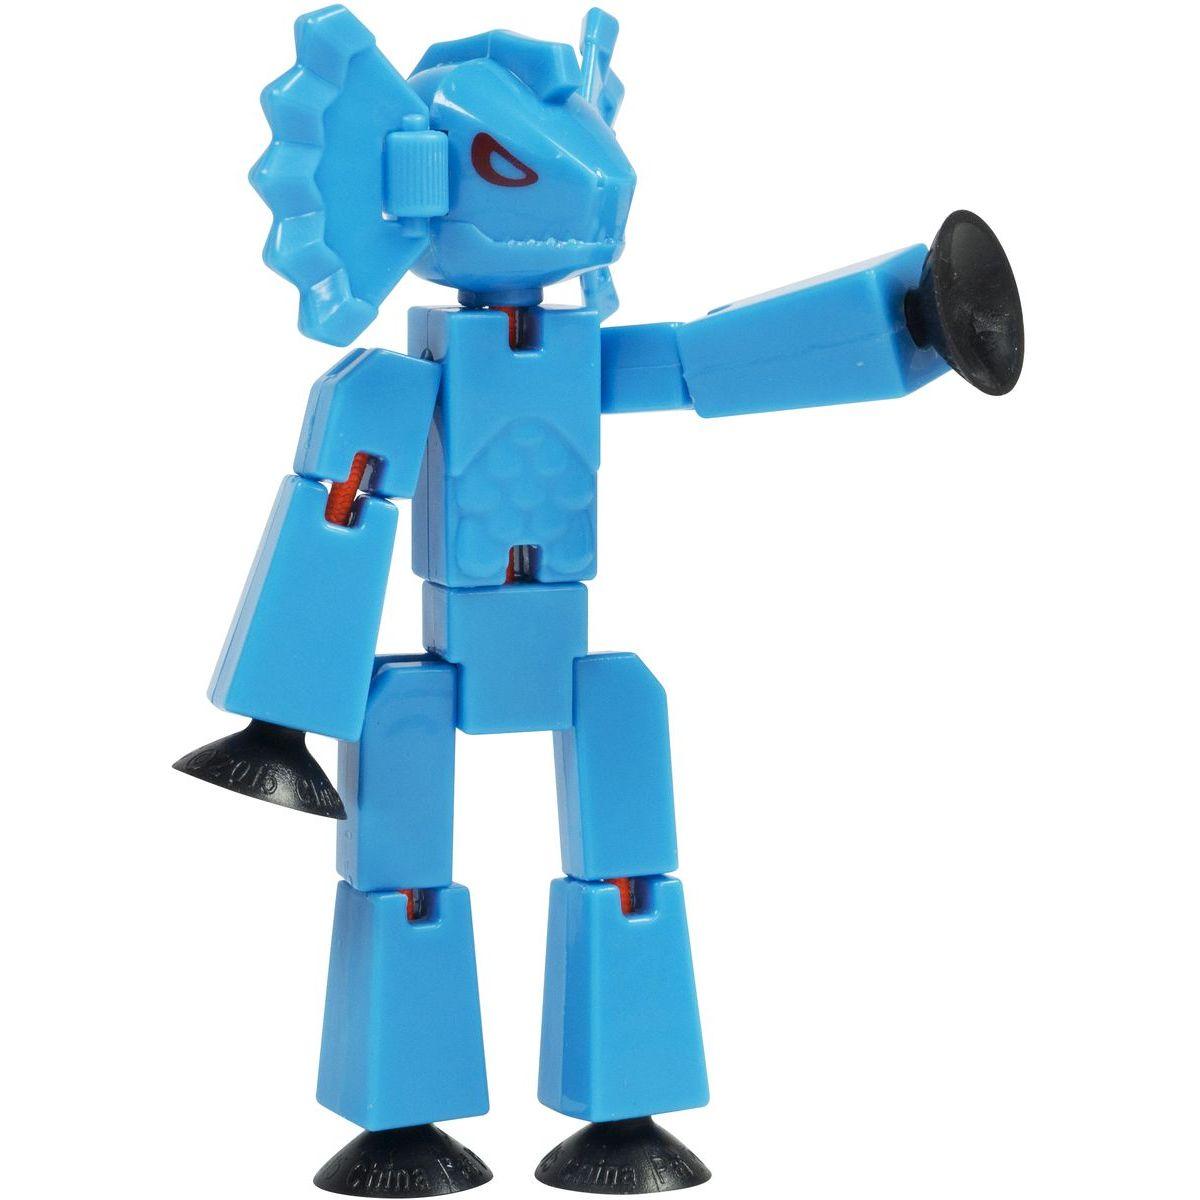 Stikbot Monsters Aquafang